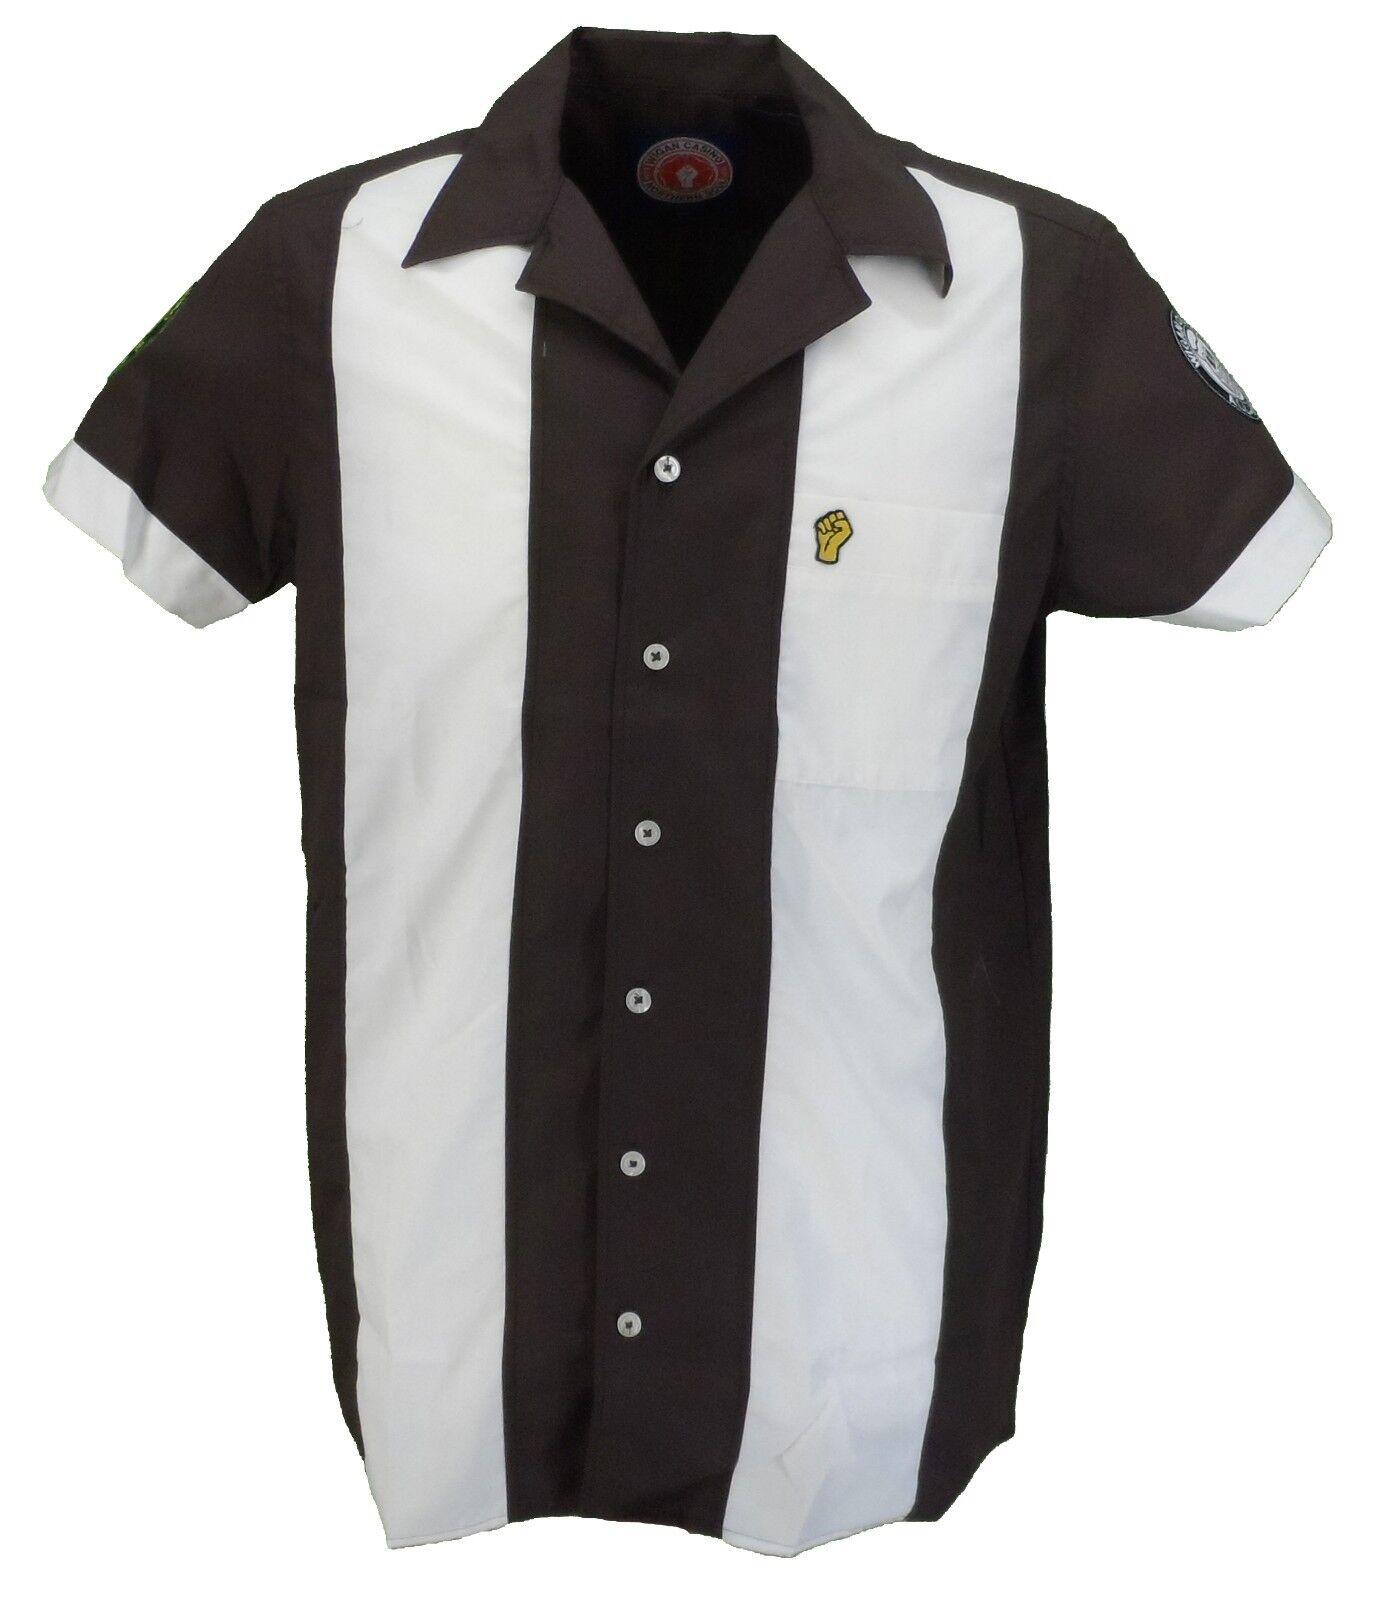 Wigan Casino Brown Retro Short Sleeved Bowling Shirt